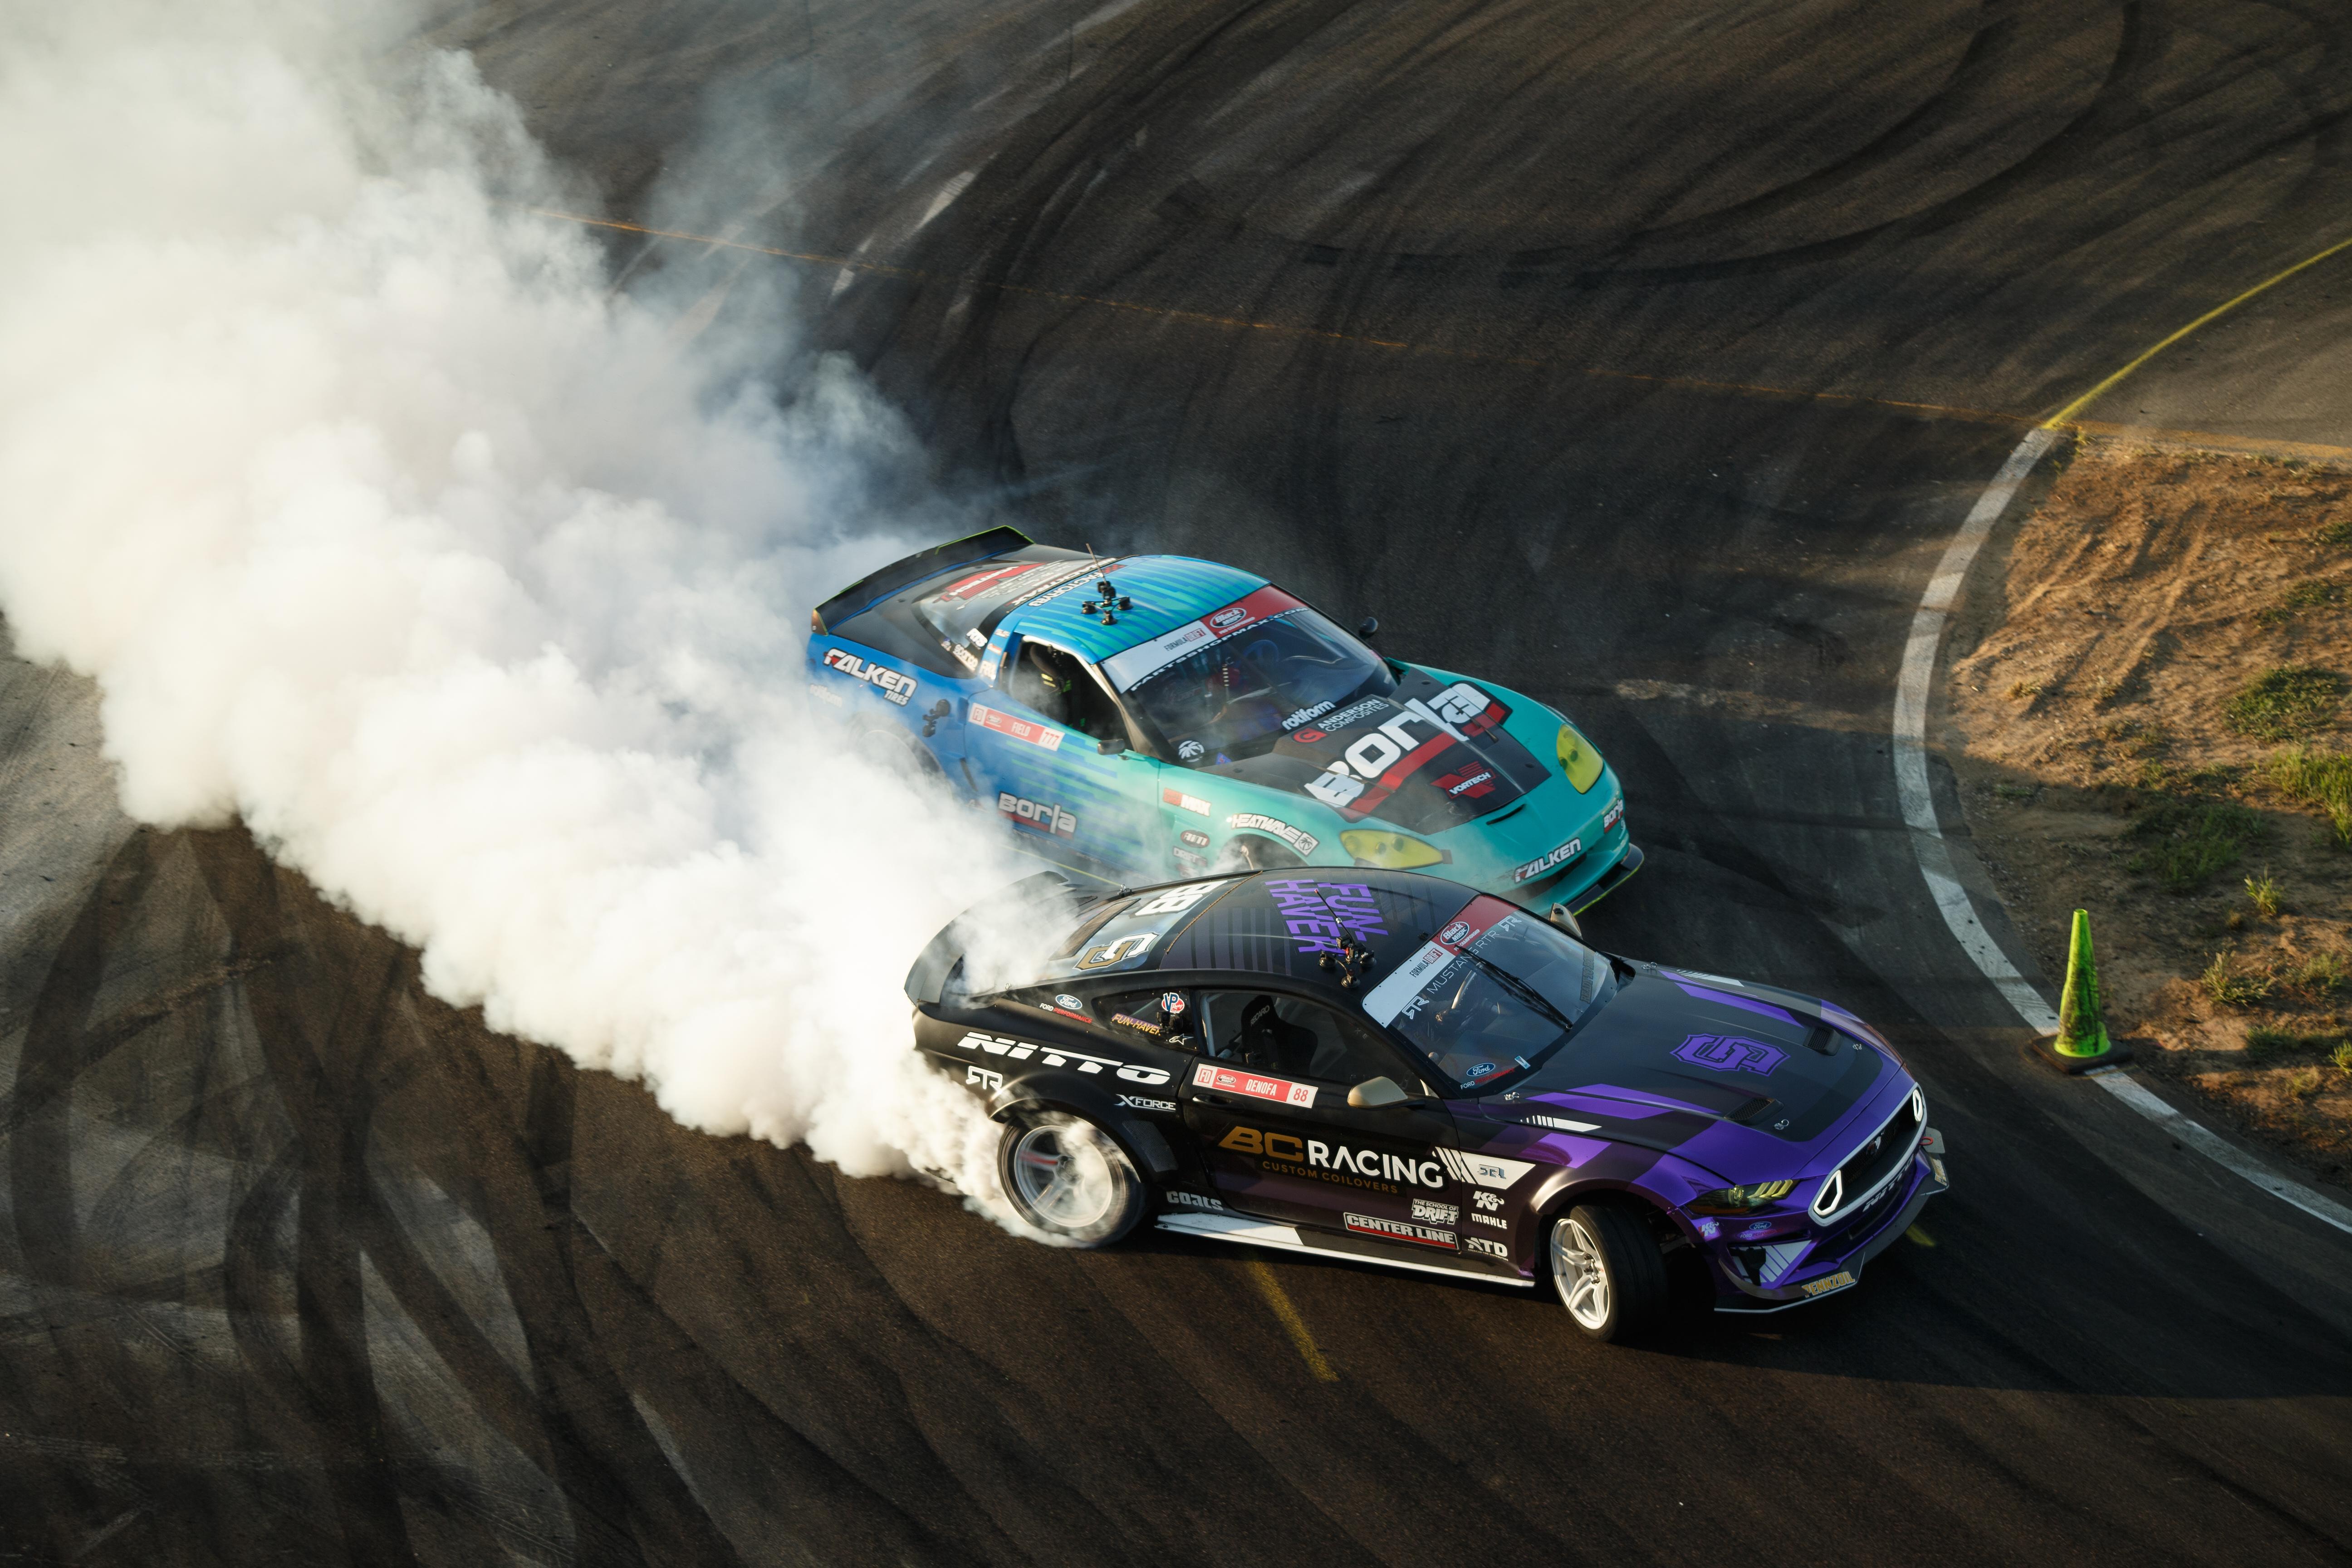 bc-racing-chelsea-denofa-gallery_9861